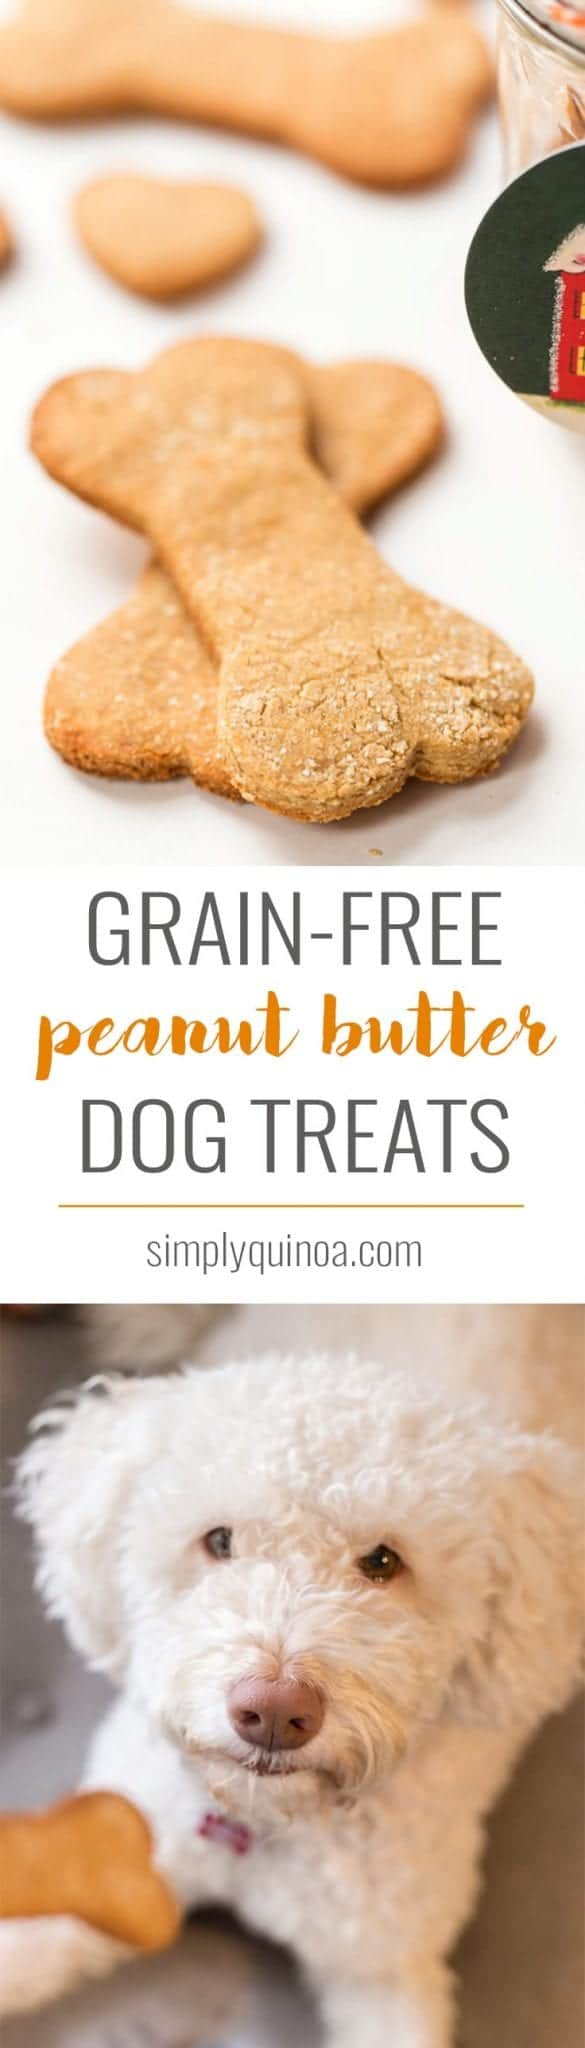 Grain Free Peanut Butter Dog Treats Simply Quinoa